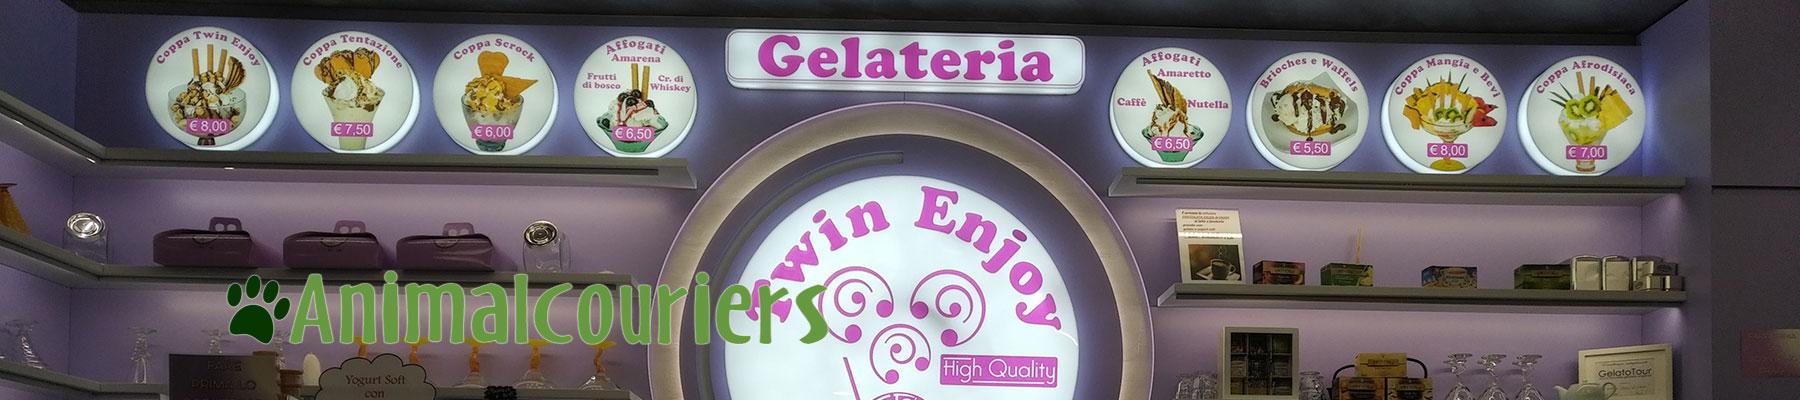 Italian Galiteria